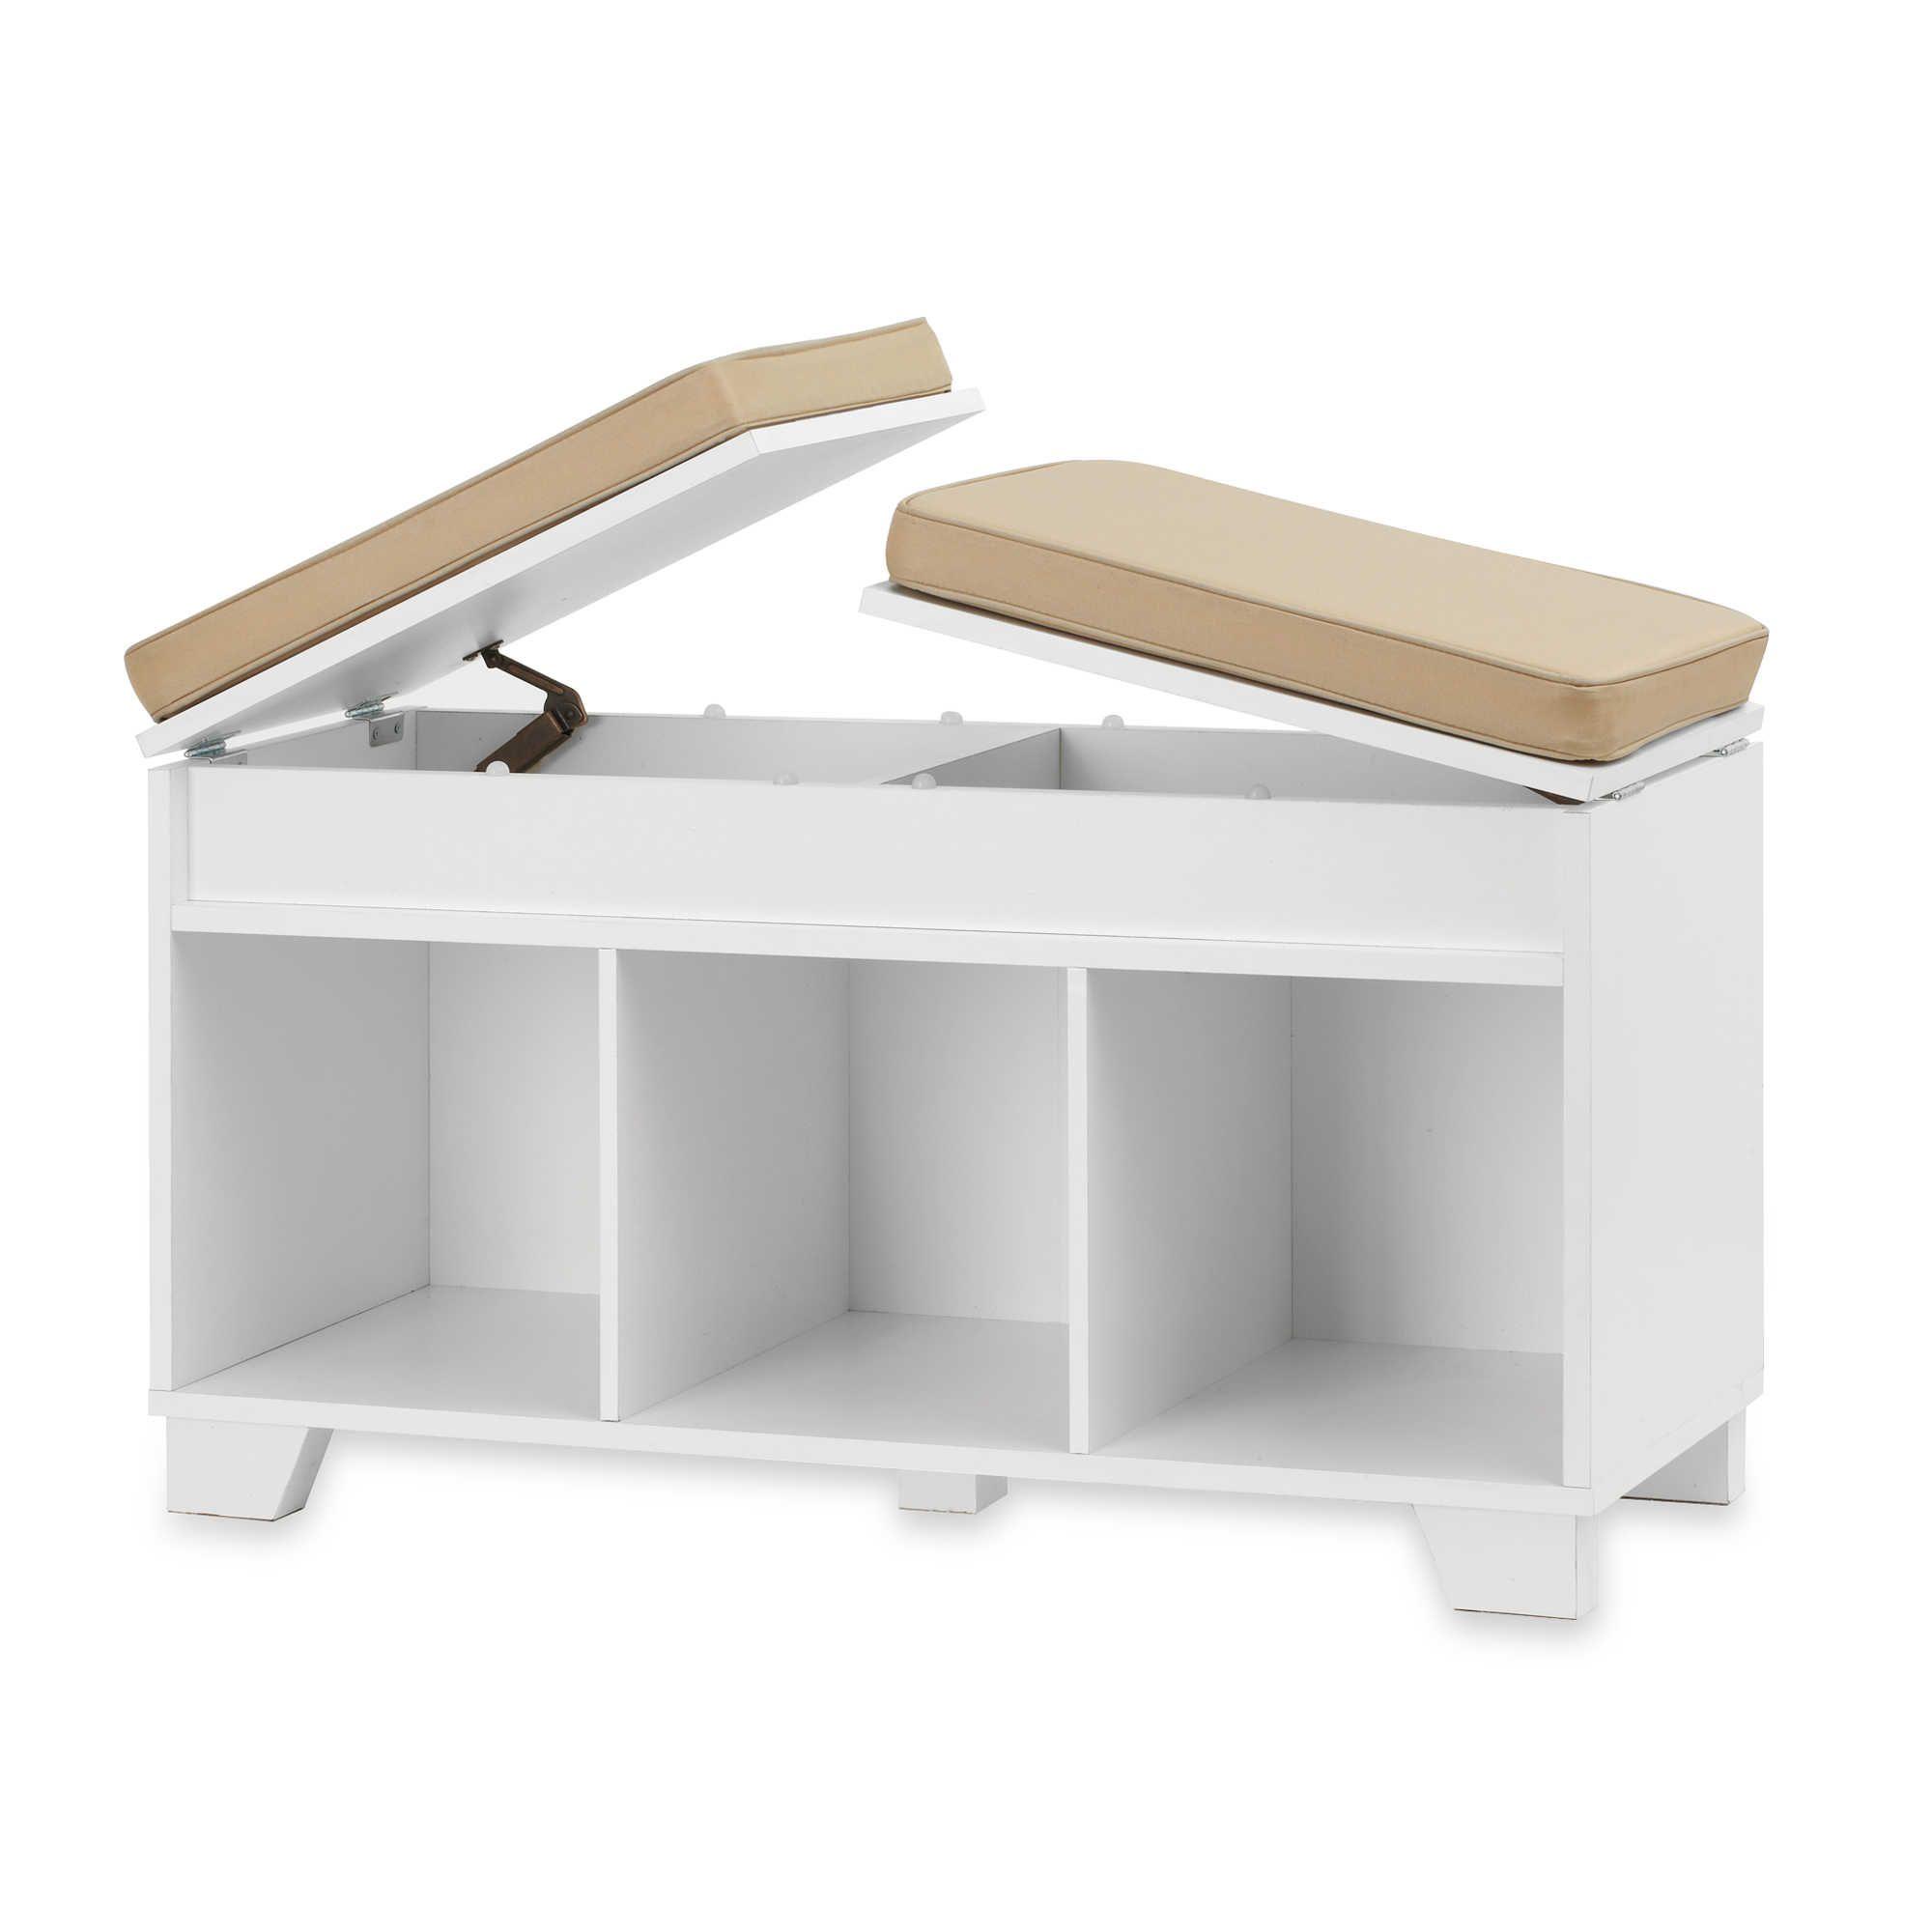 Real Simple 3 Cube Split Top Storage Bench In White White Storage Bench Cube Storage Bench Bench With Storage